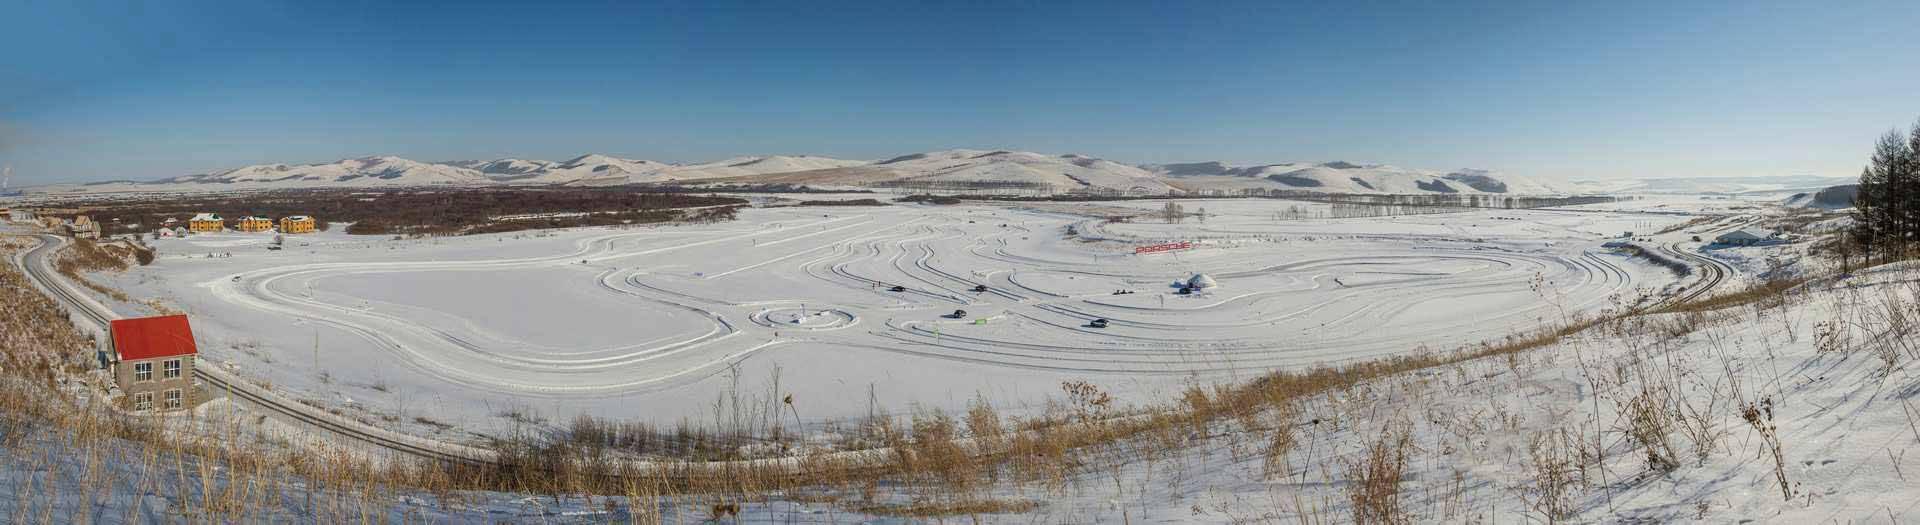 _Porsche-Snow-Force-voll